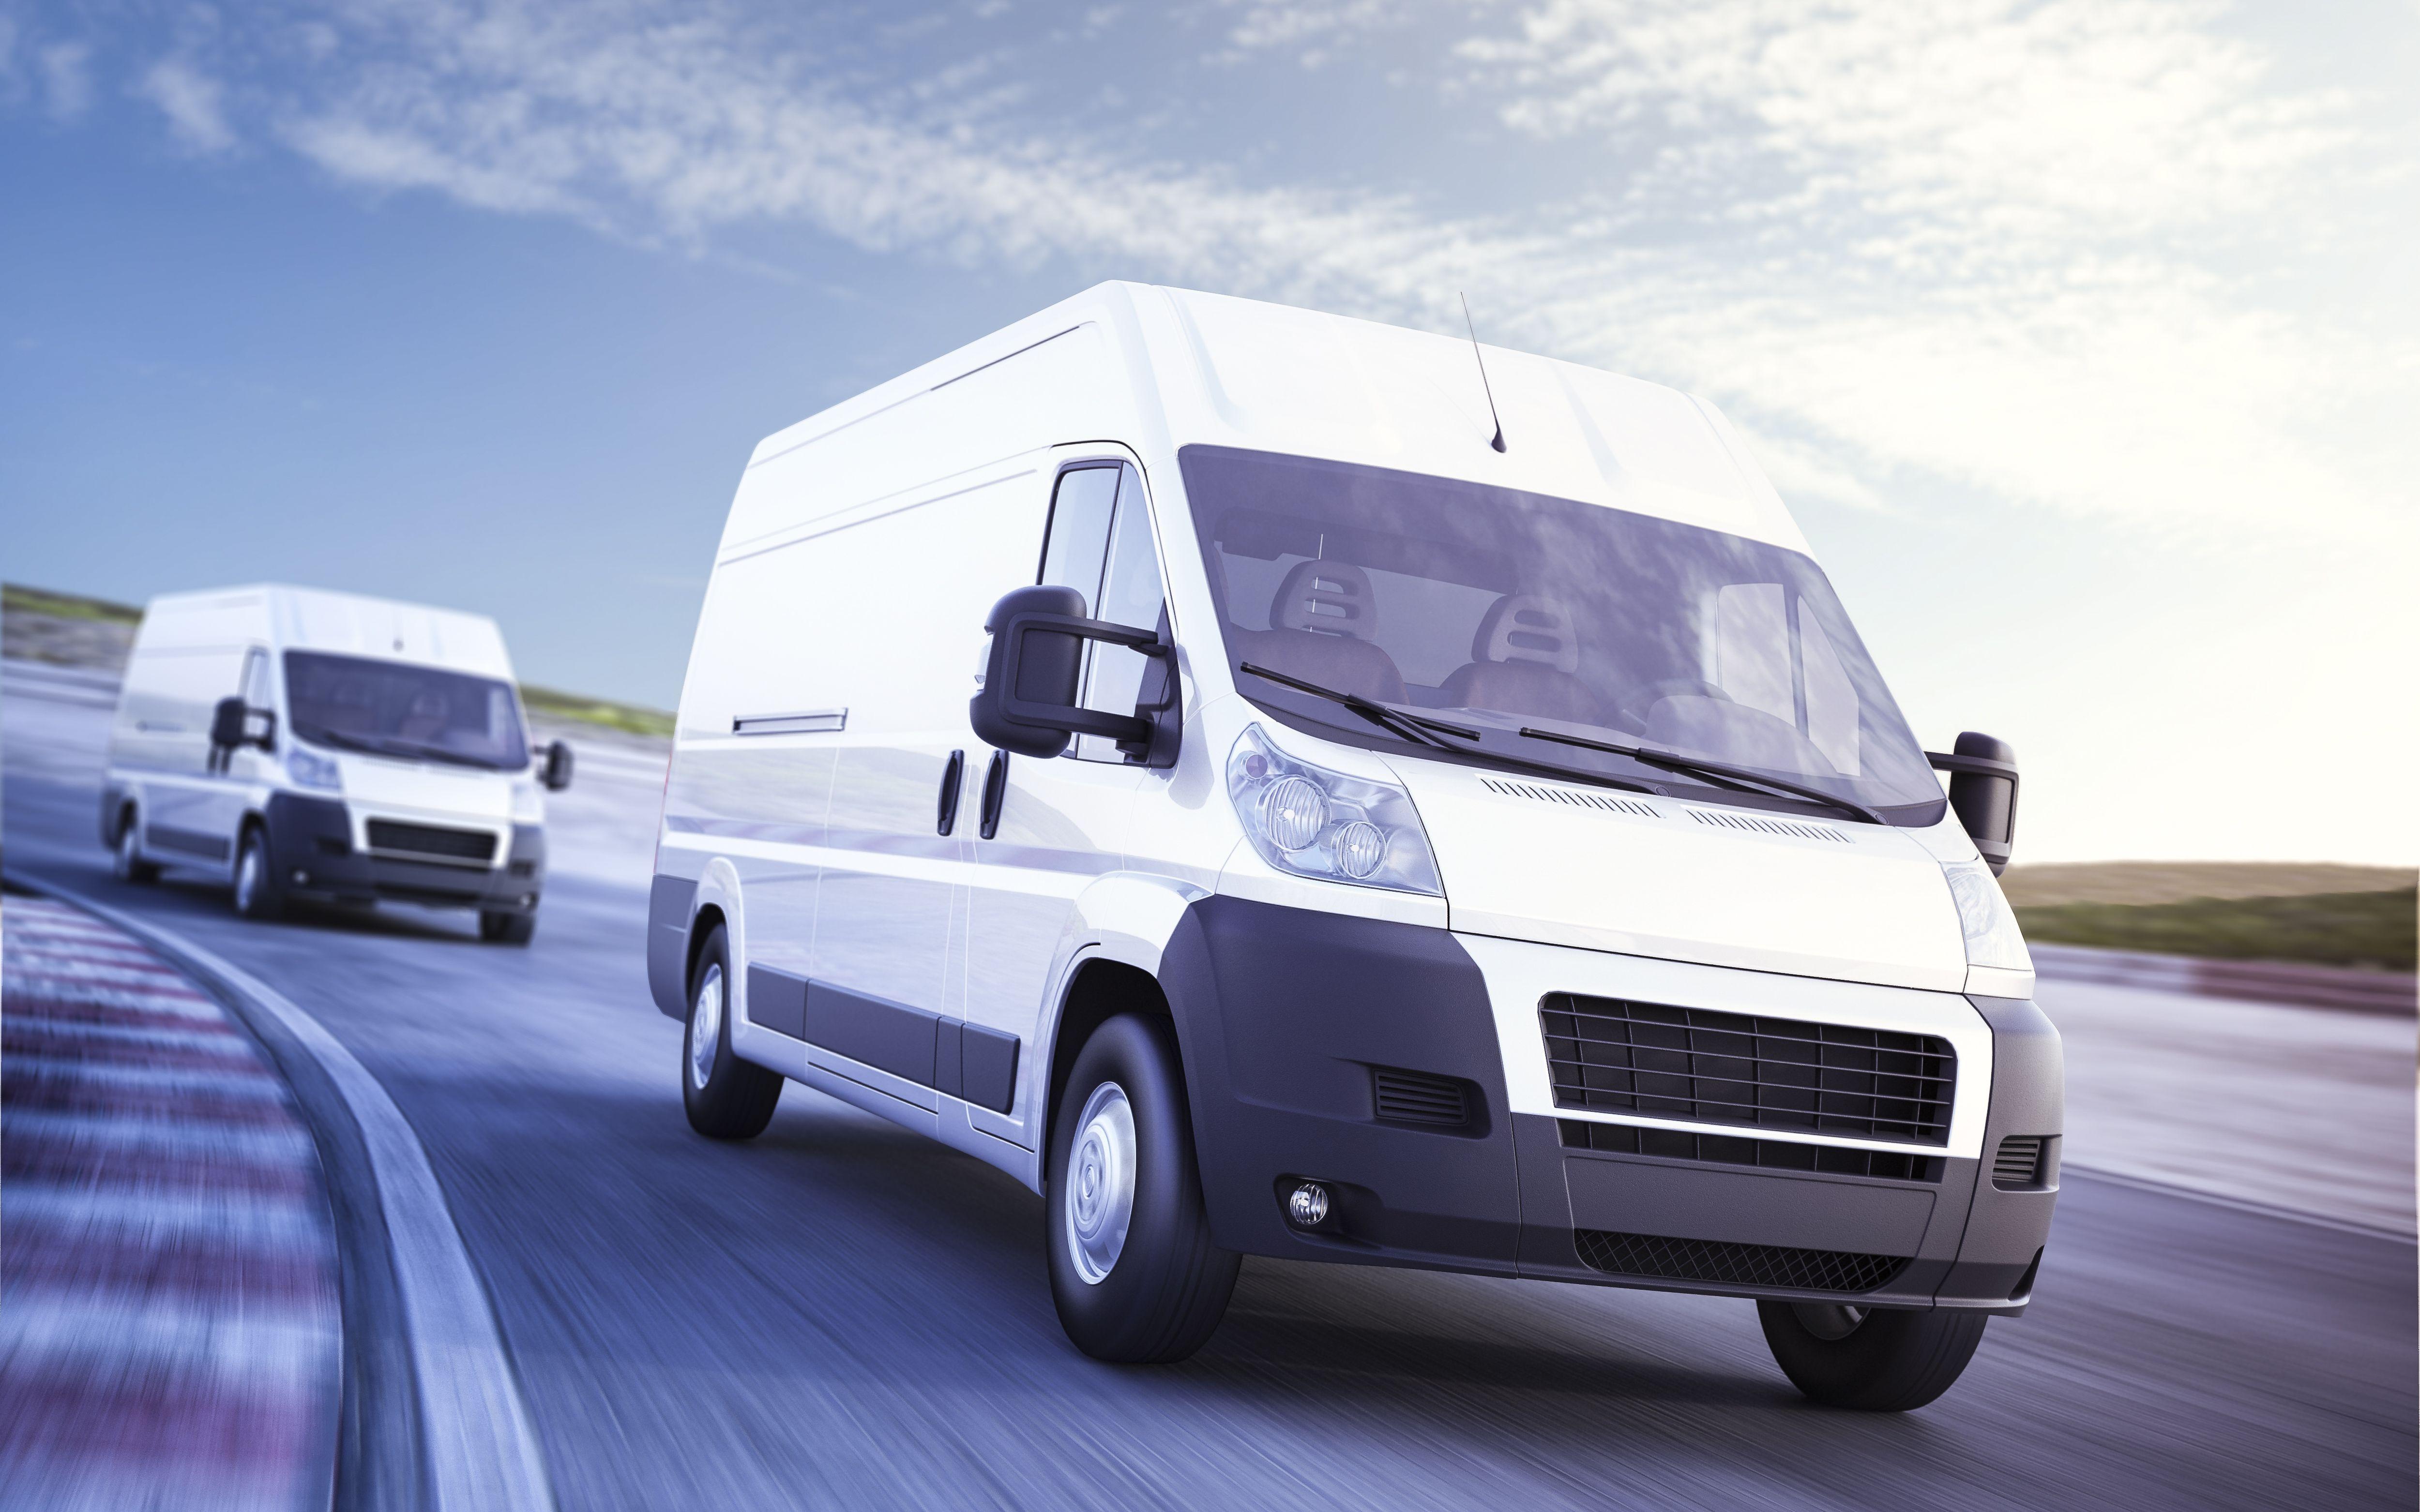 Alquiler de furgonetas de carga: Alquiler de vehículos de Autos Rioja